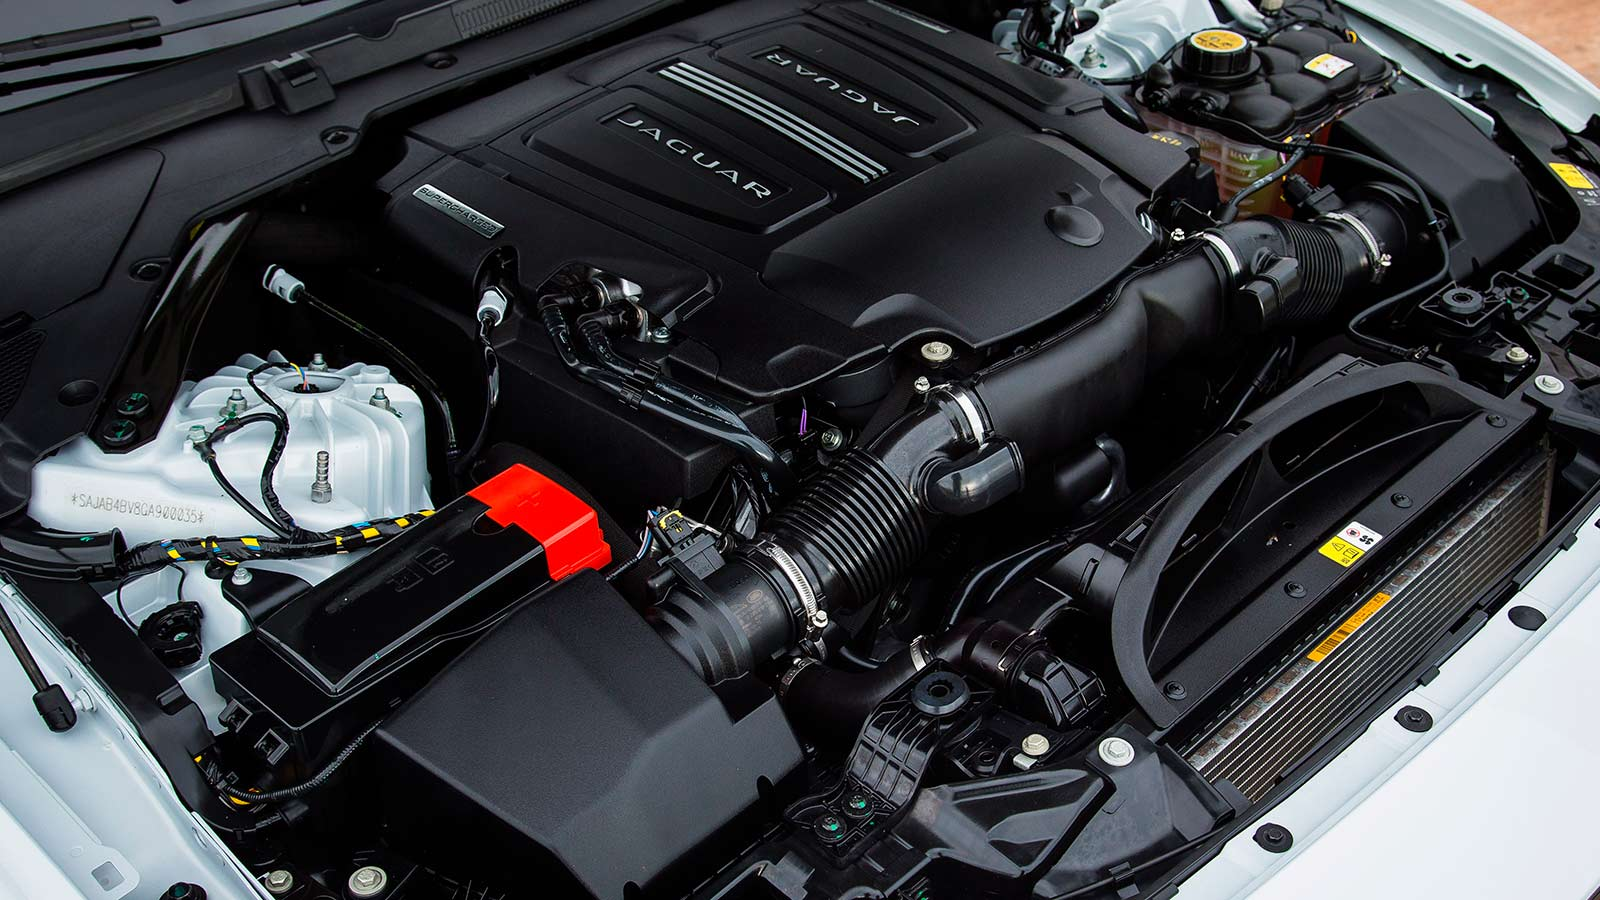 Диагностика и ремонт Jaguar в сервисе MS-48